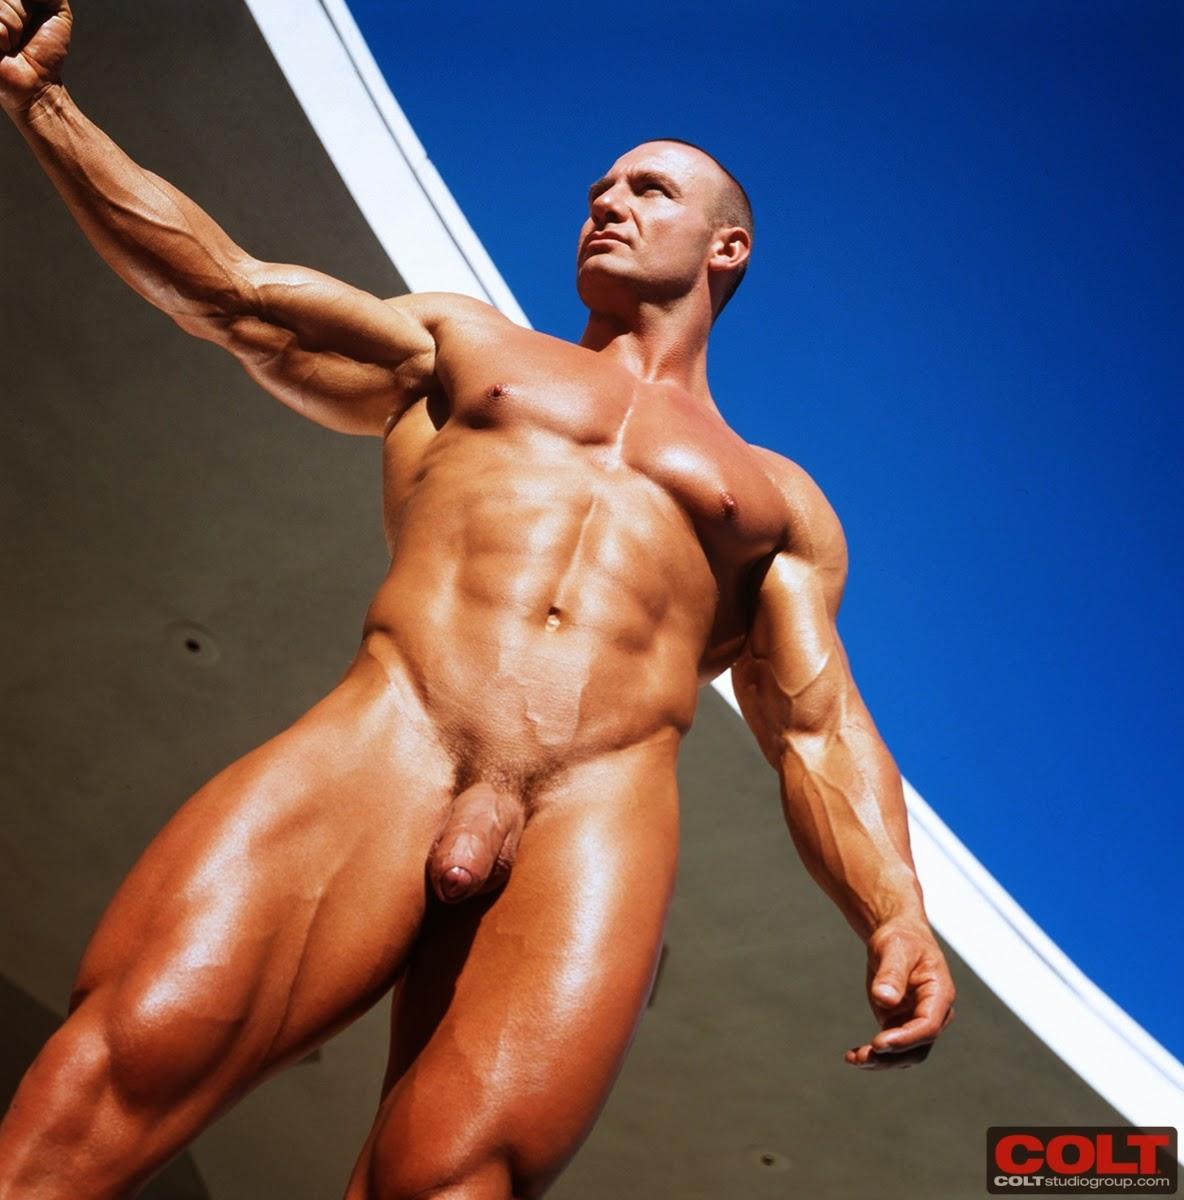 gay straight big dude dick sex